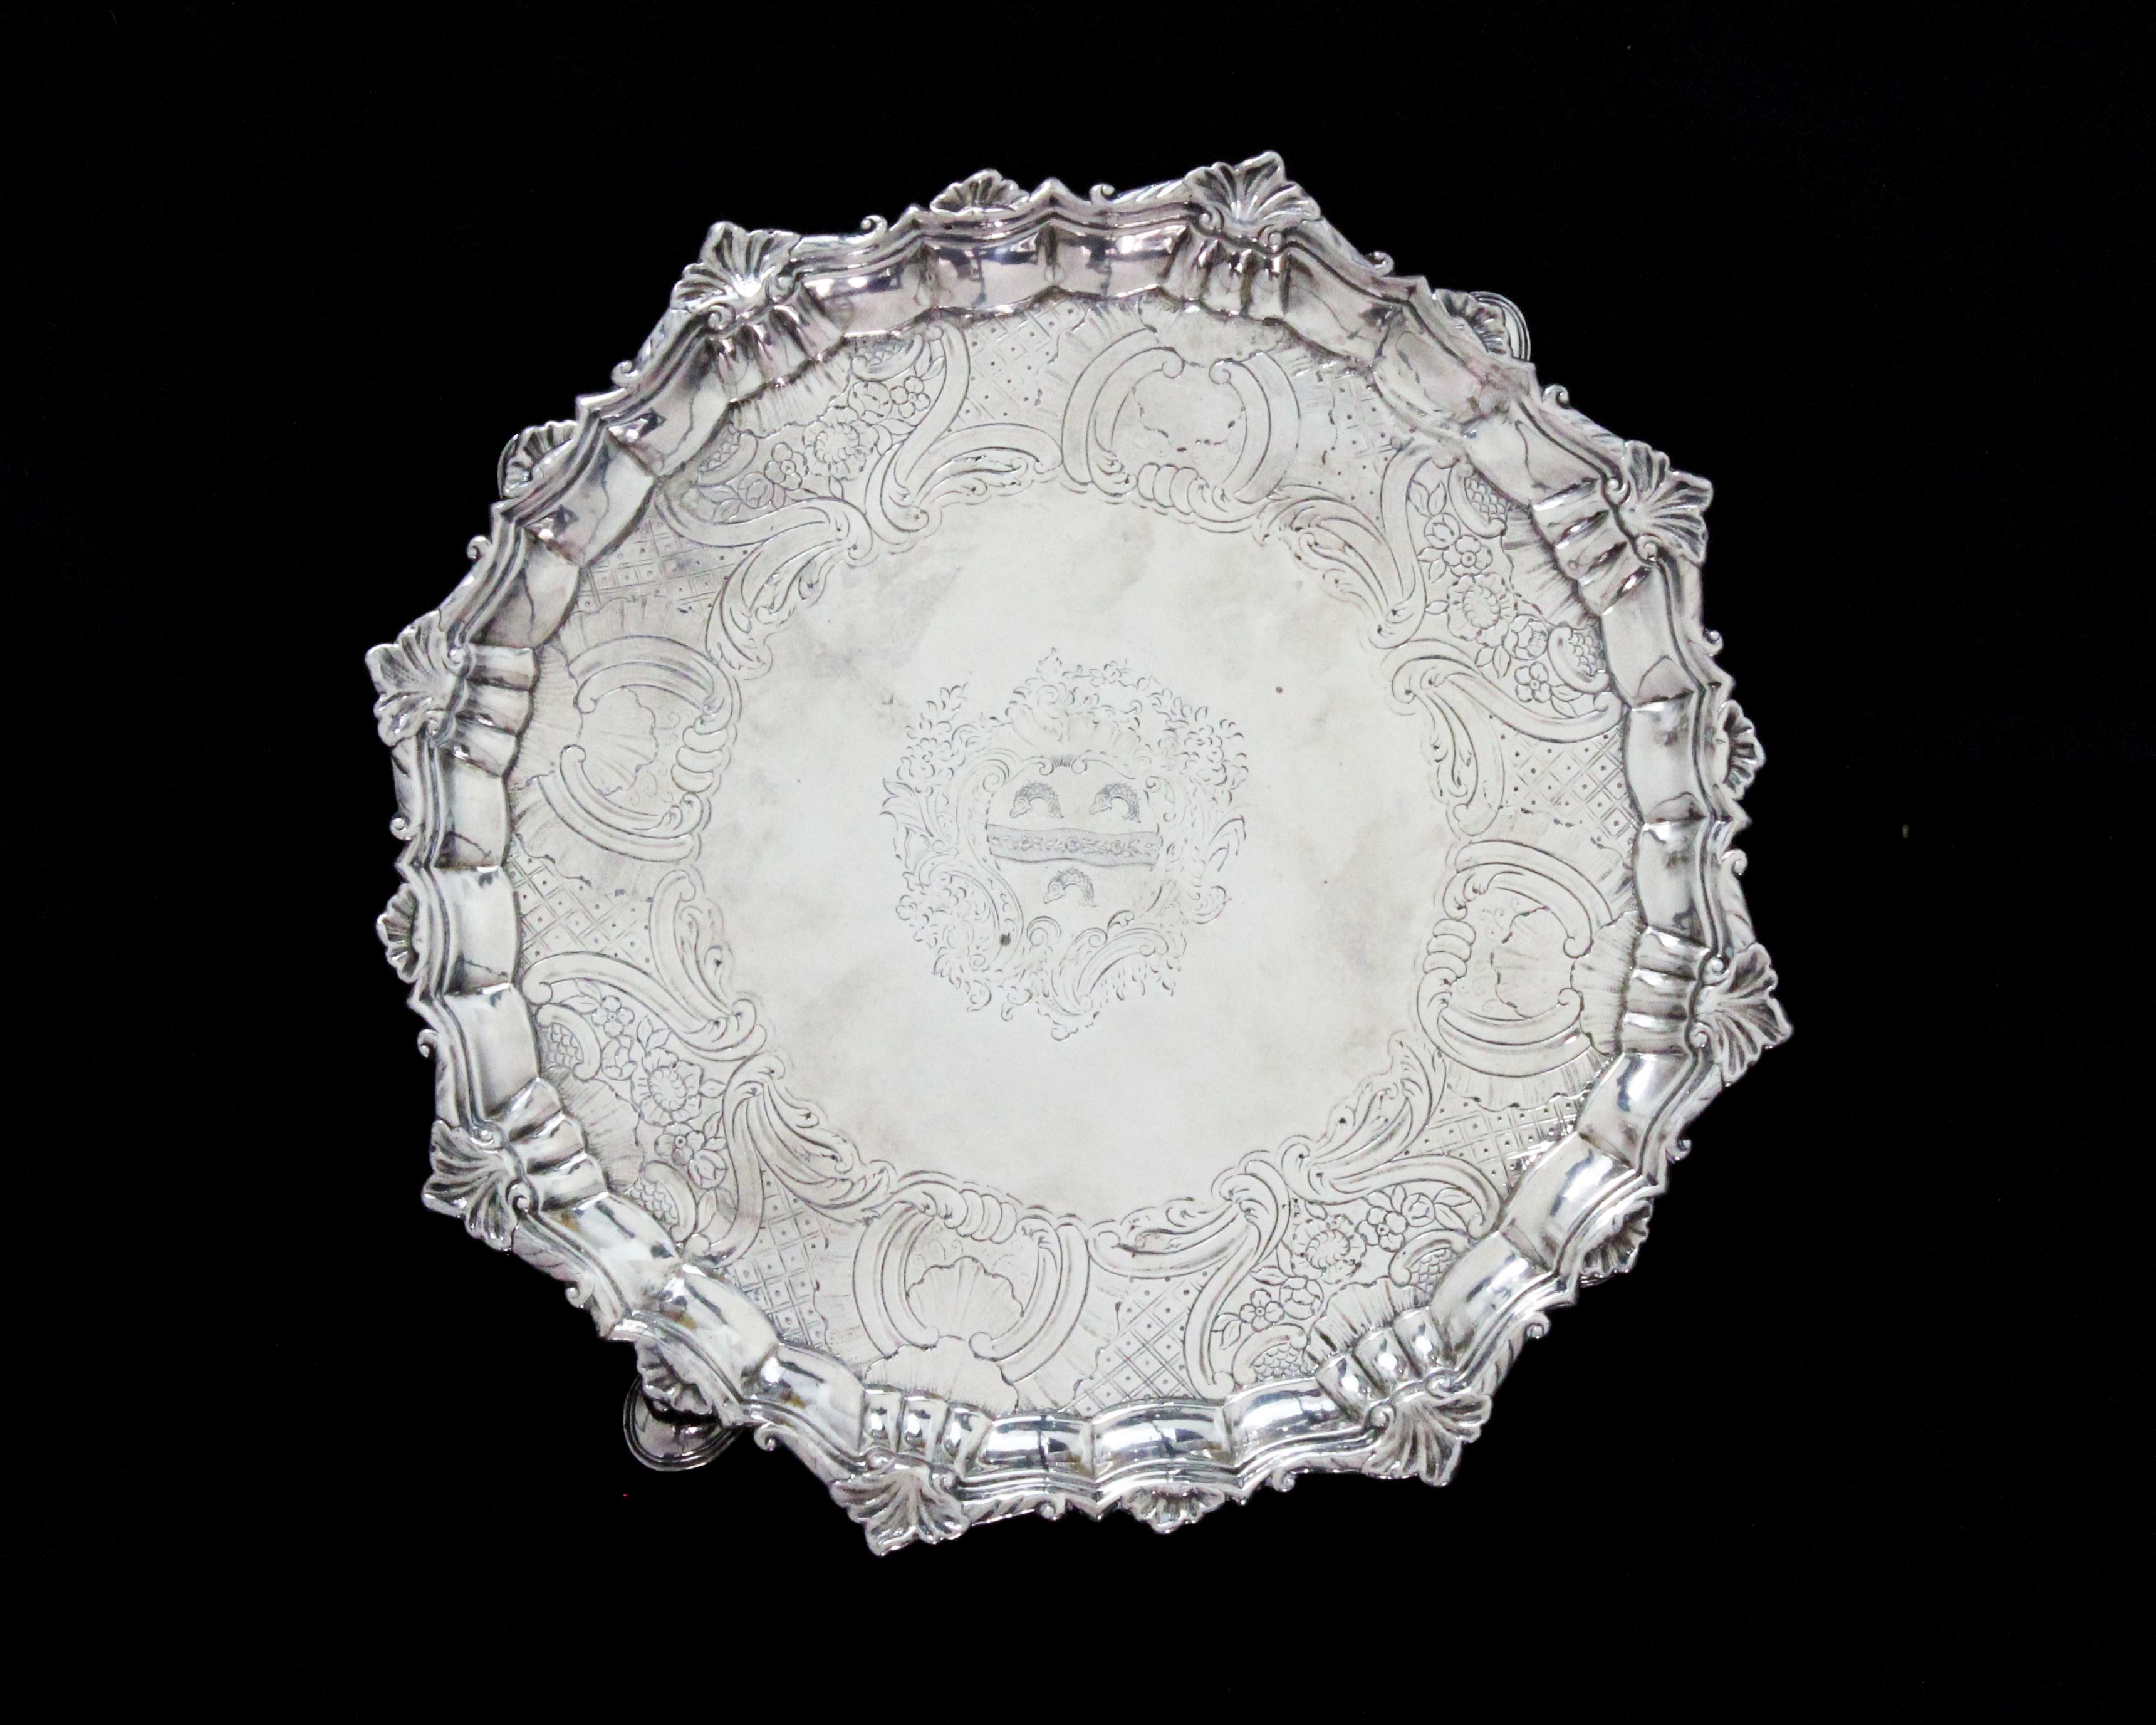 An antique George II Irish Sterling Silver salver / tray by John Laughlin, Dublin circa 1750 of